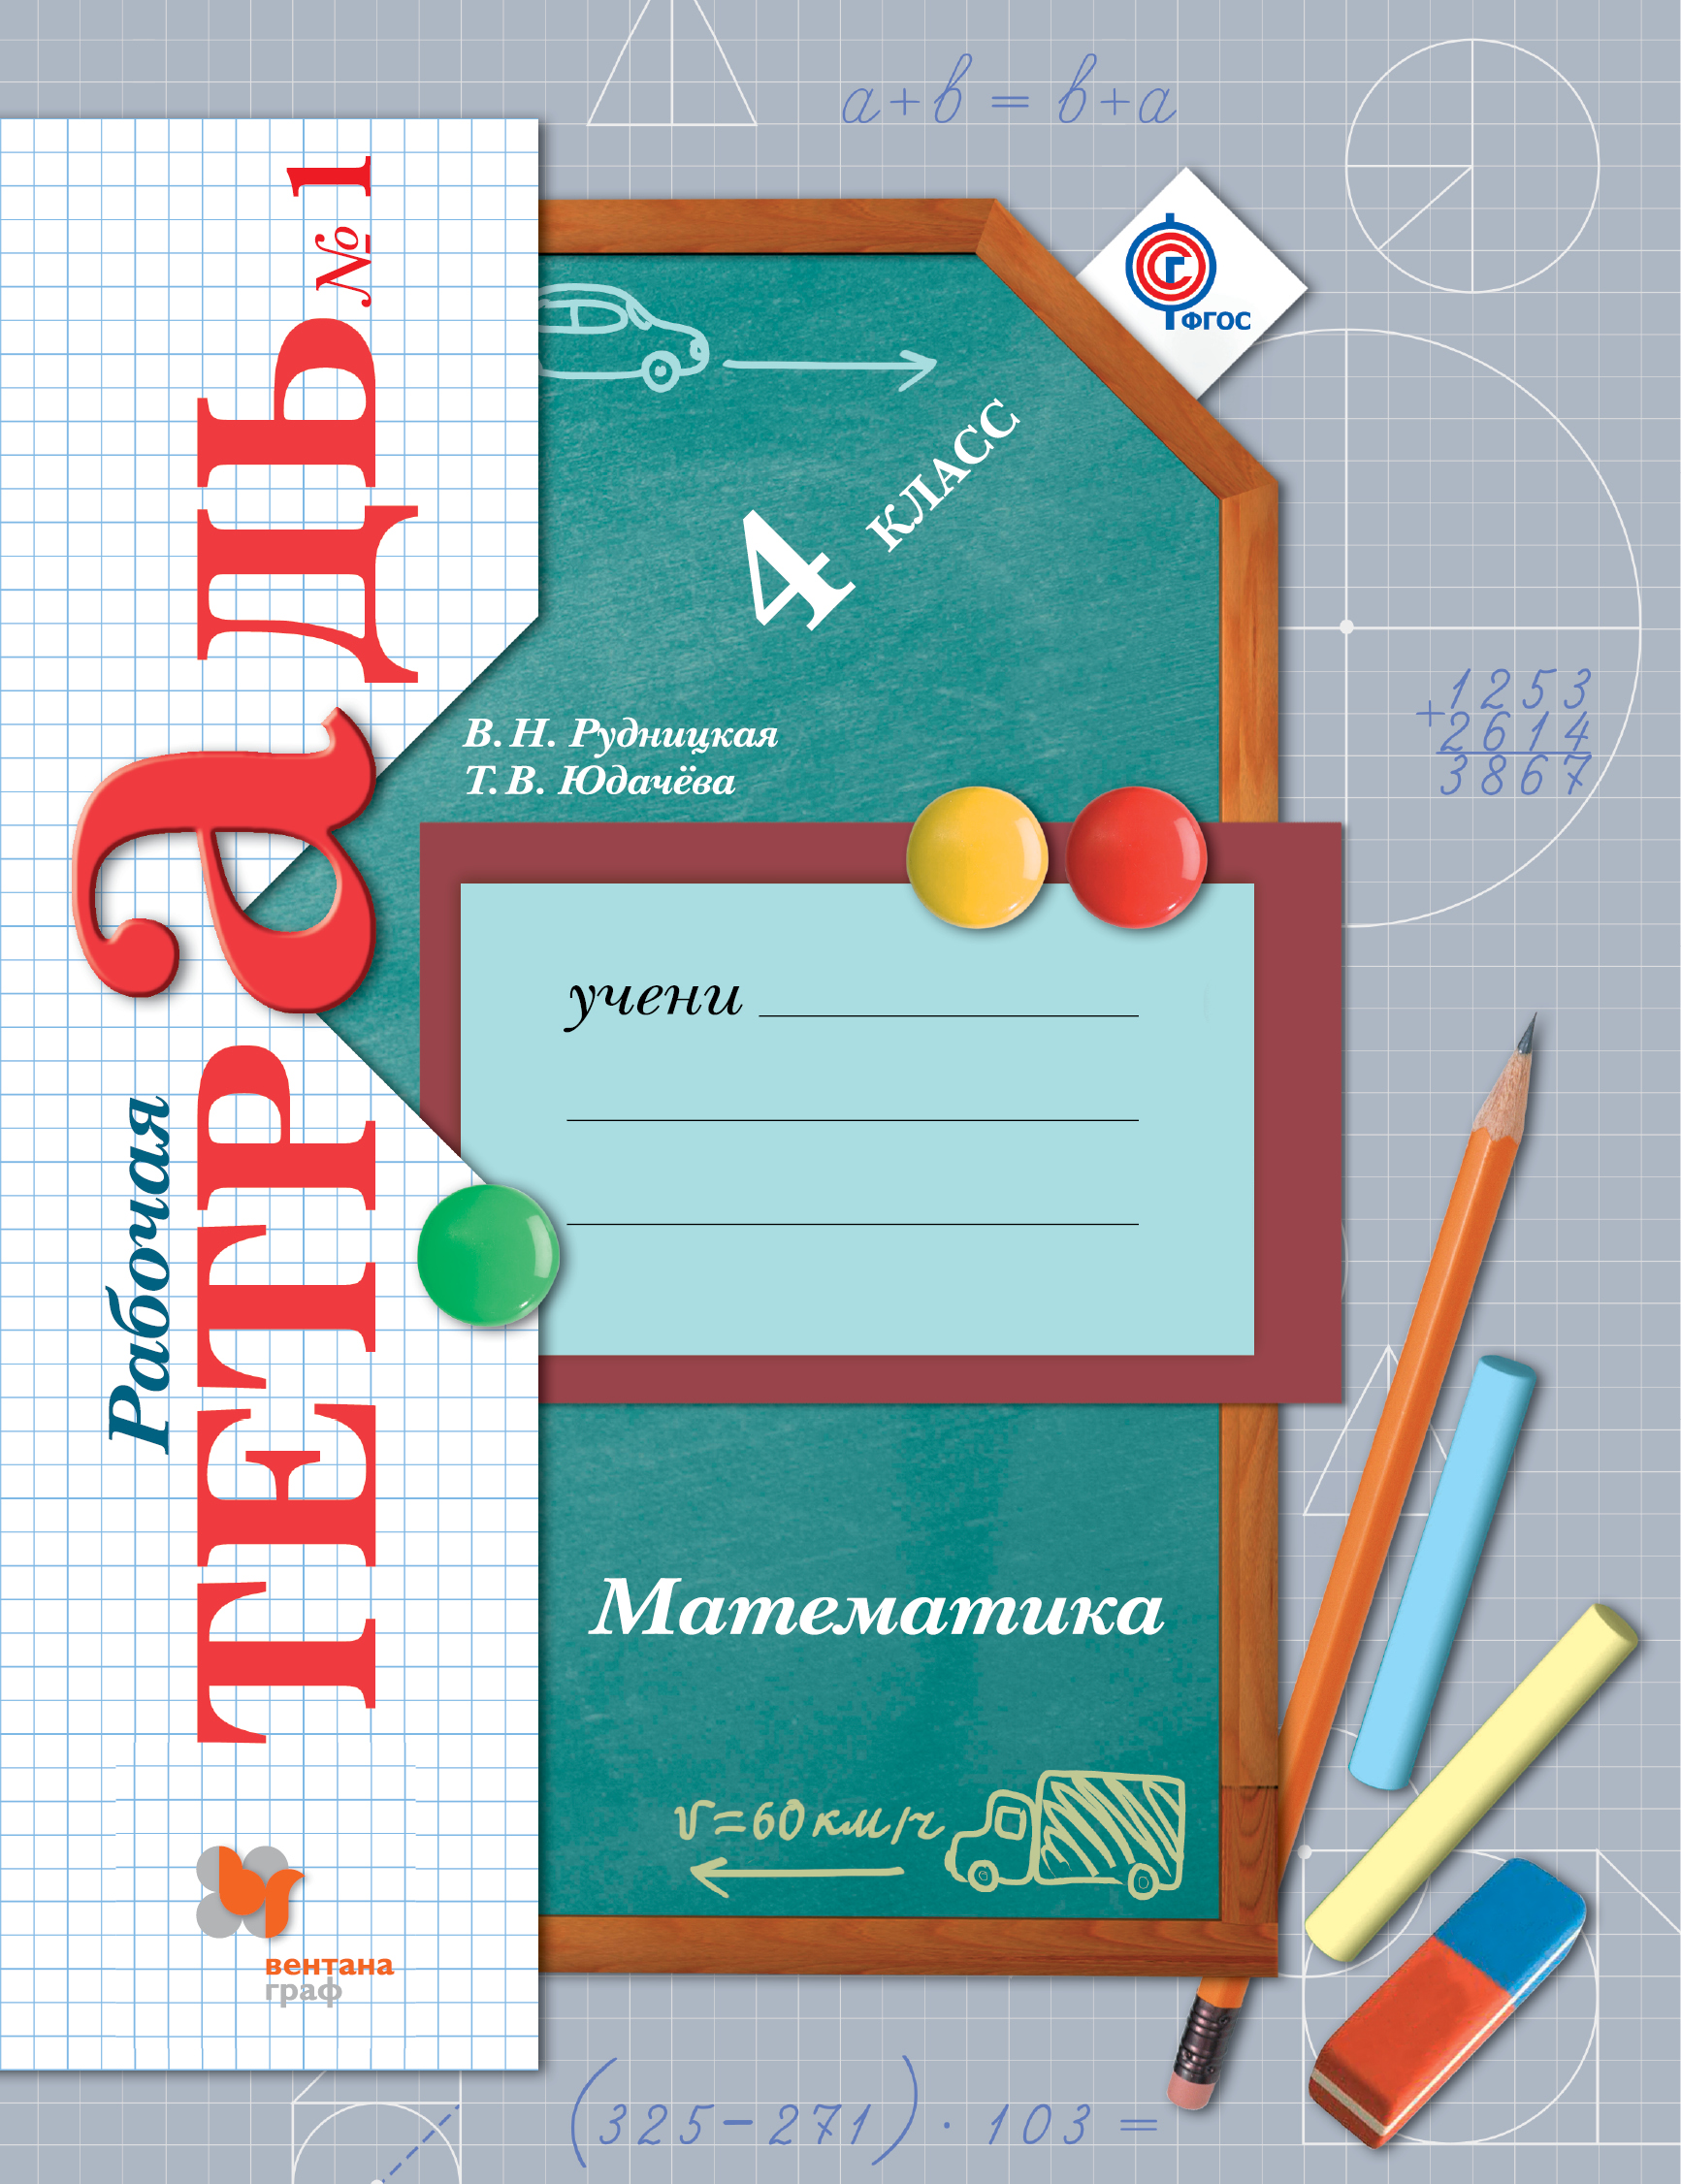 В. Н. Рудницкая, Т. В. Юдачева Математика. 4класс. Рабочая тетрадь №1 цена 2017